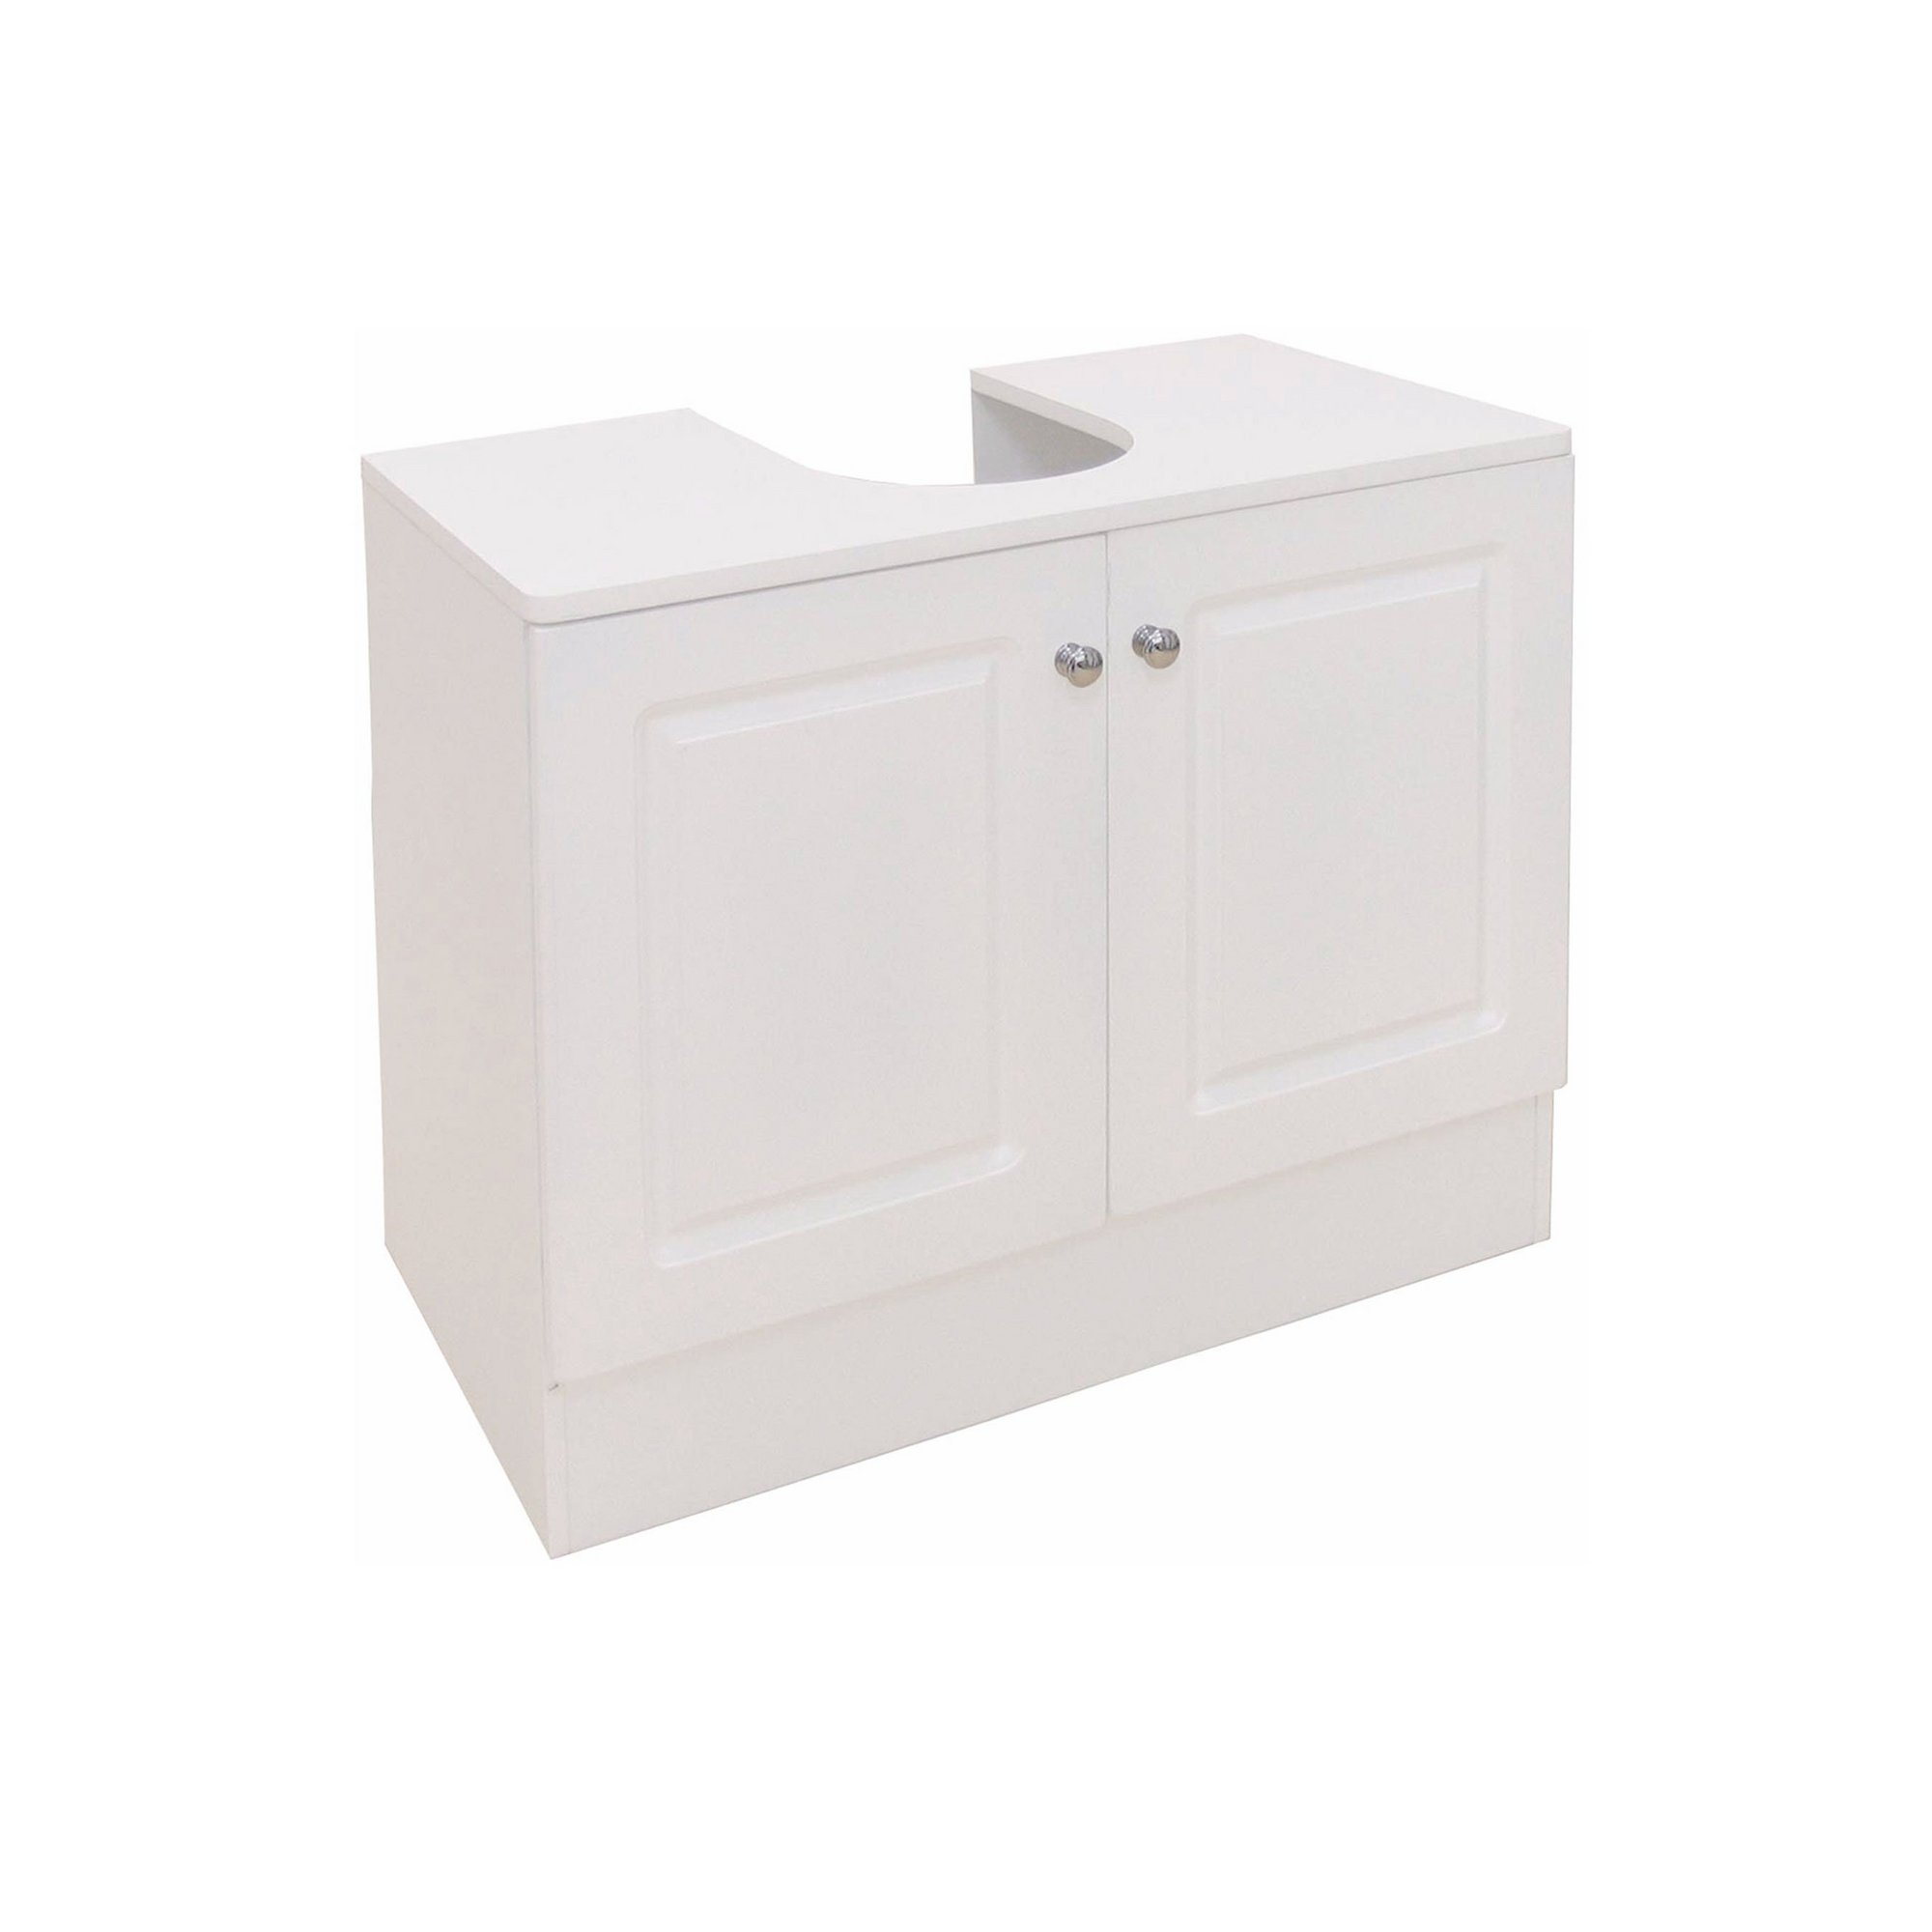 Image of Bathroom Basin Cabinet